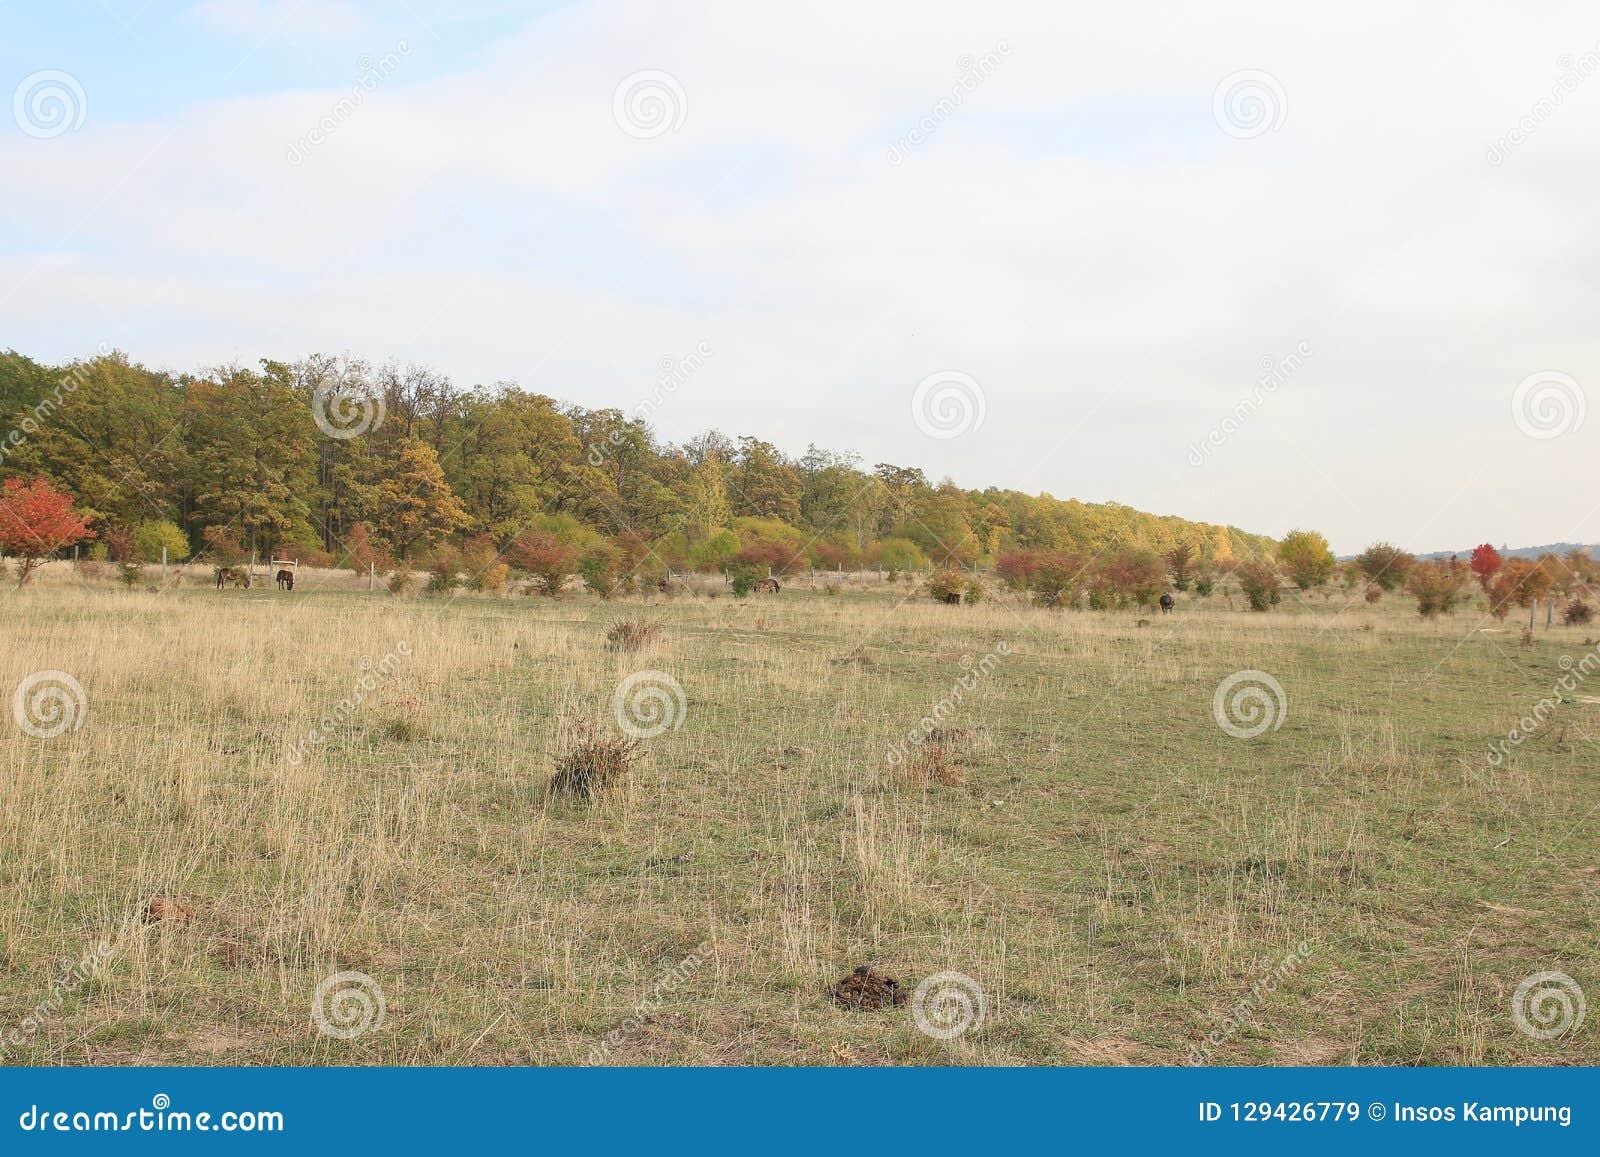 Traviny Nature Reserve, Czech Republic